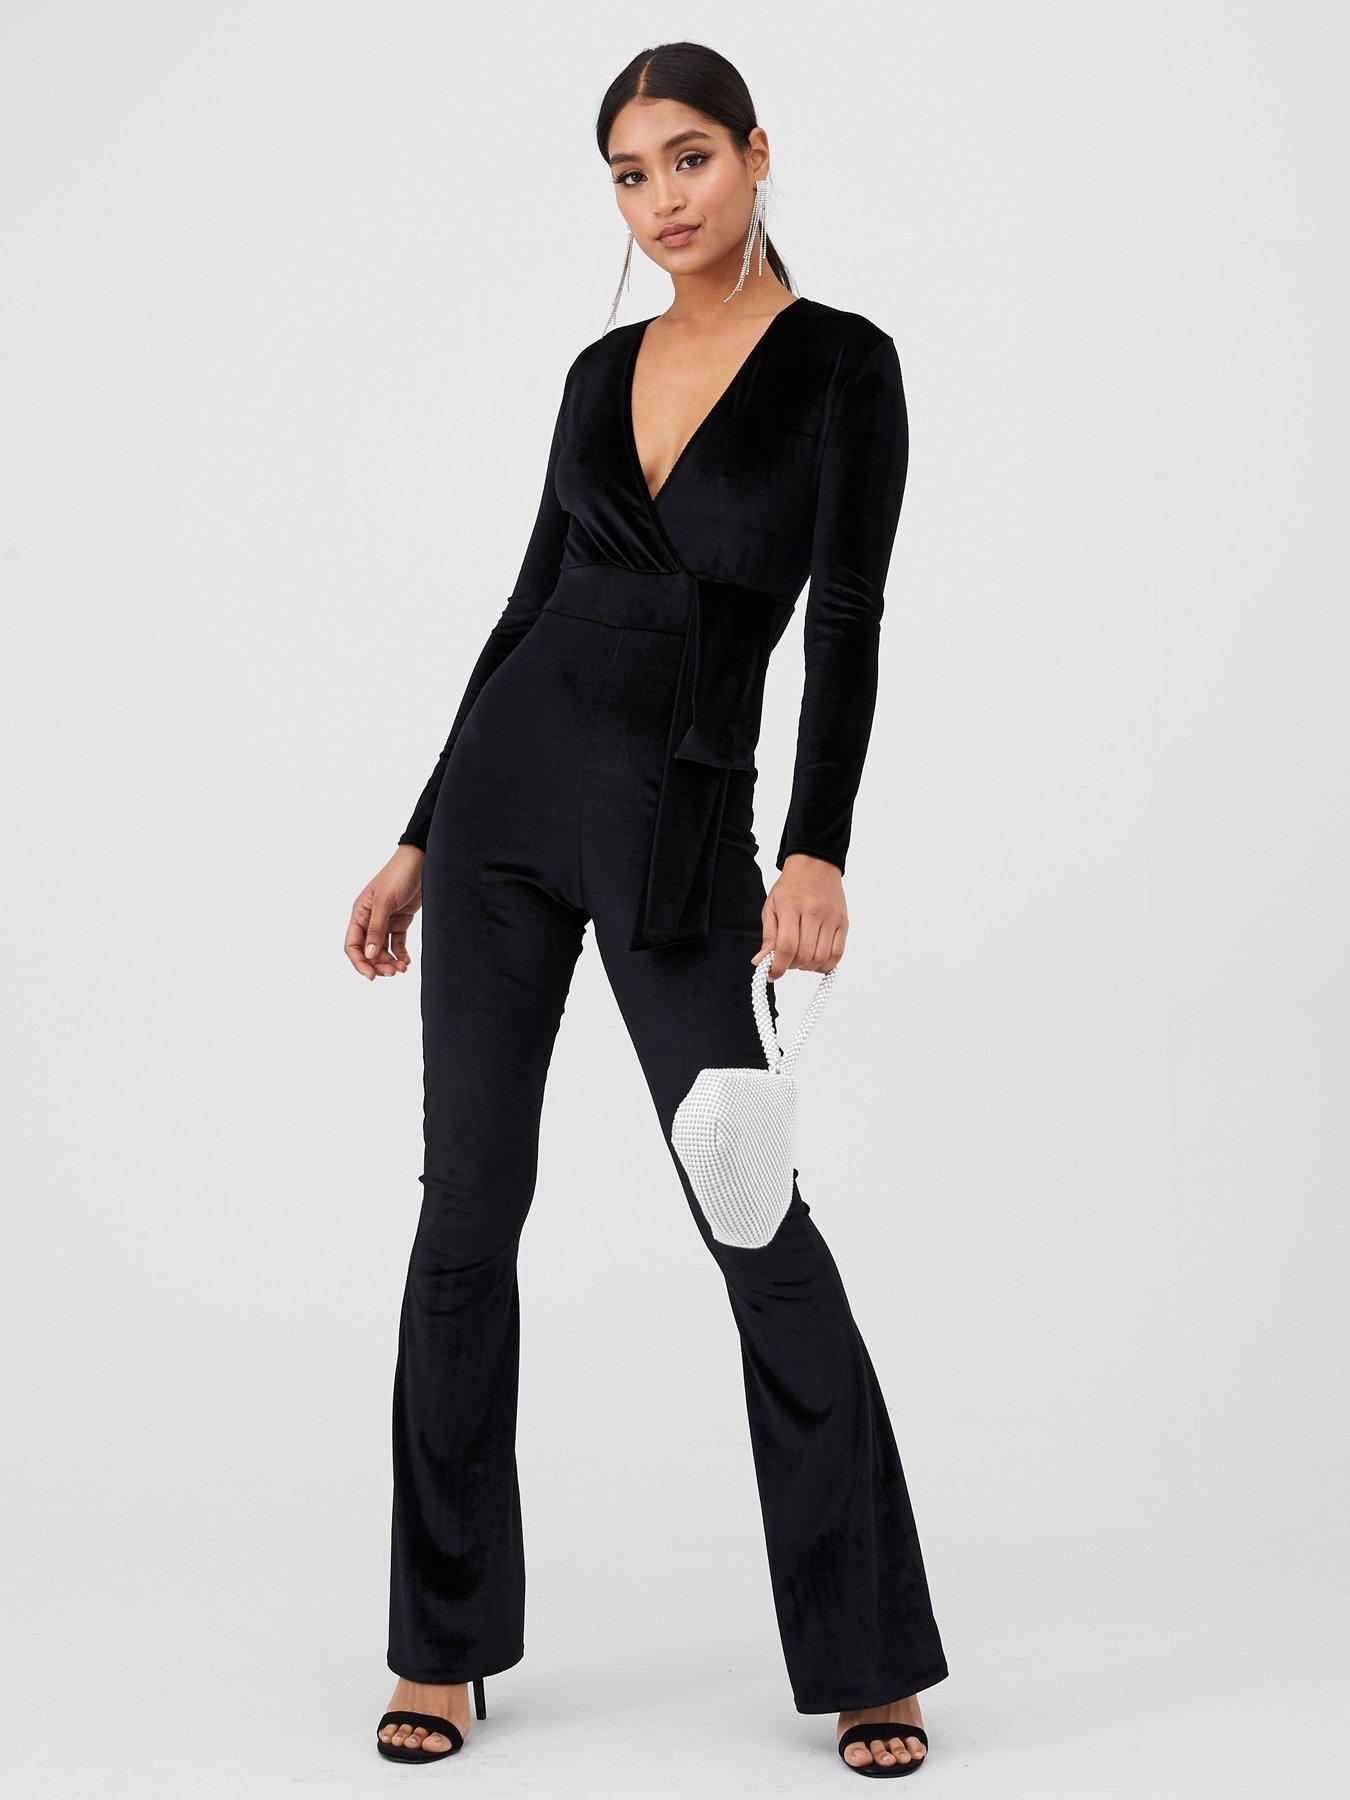 Baylis /& Knight BLACK JERSEY Puff Short Sleeve MINI Play Cat Jump Suit